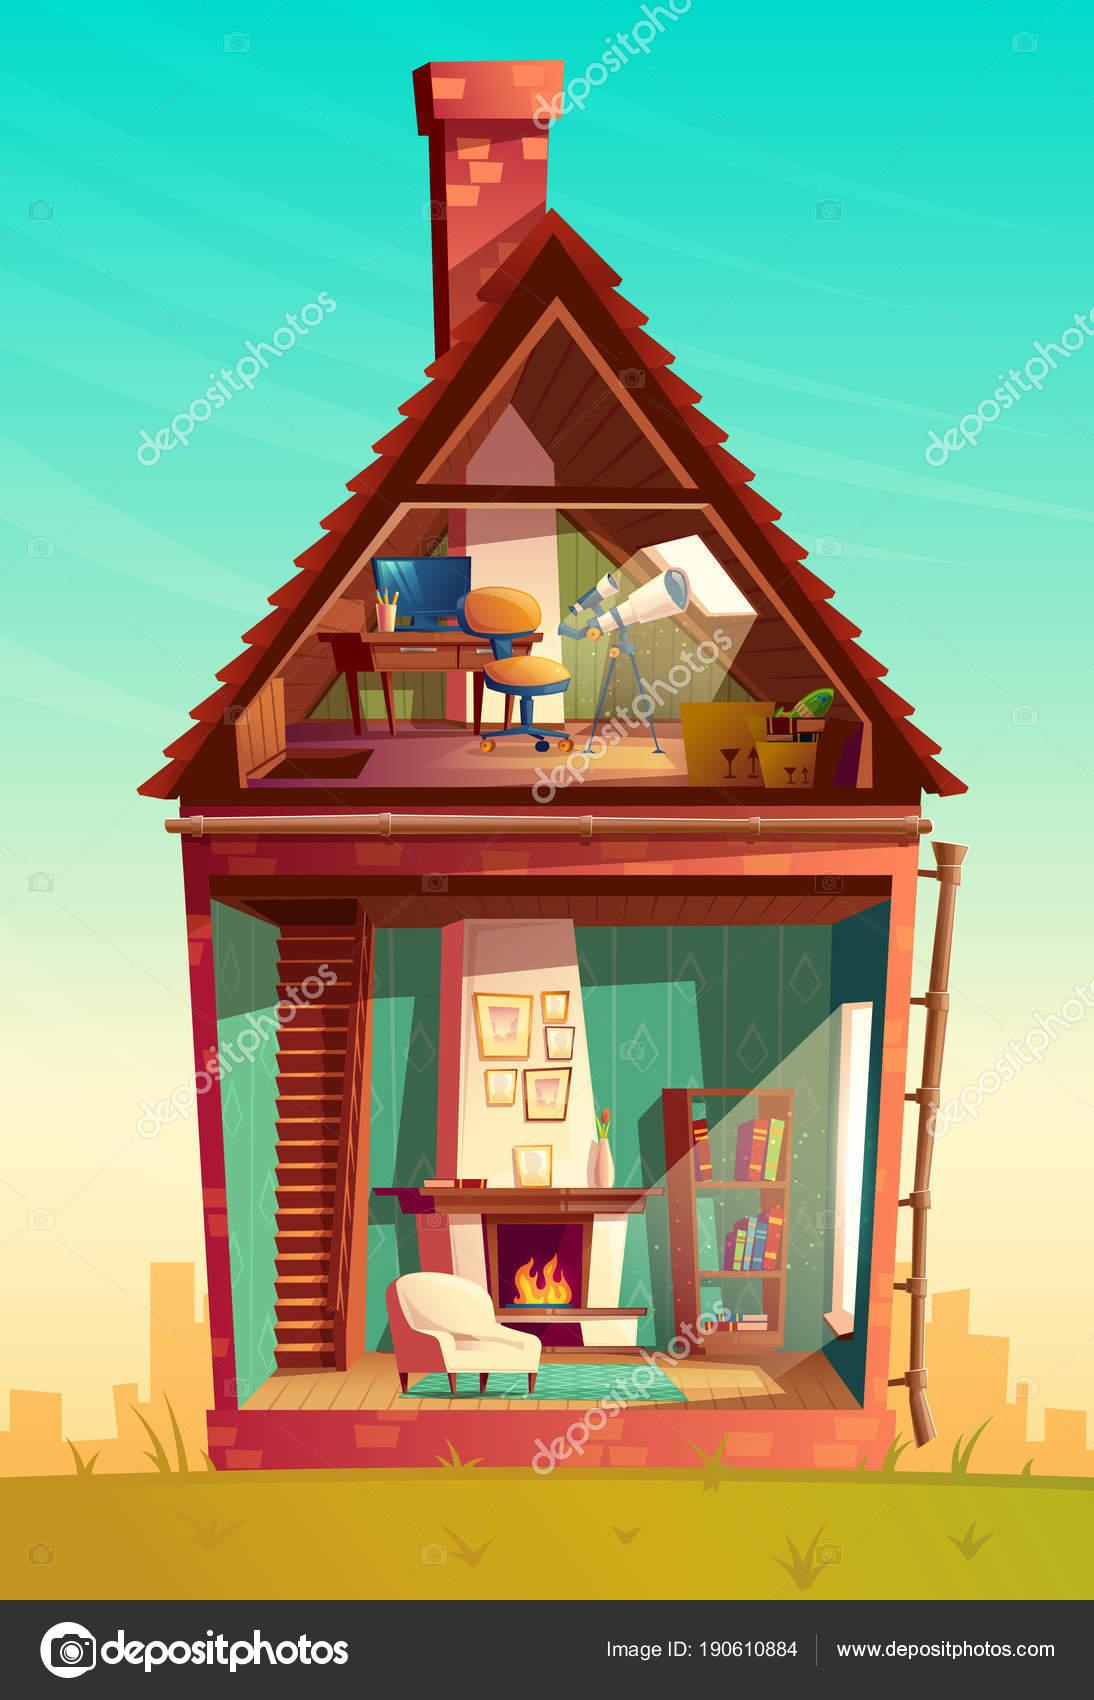 Imágenes Casa Por Dentro Animadas Interior Casa Vector Sección